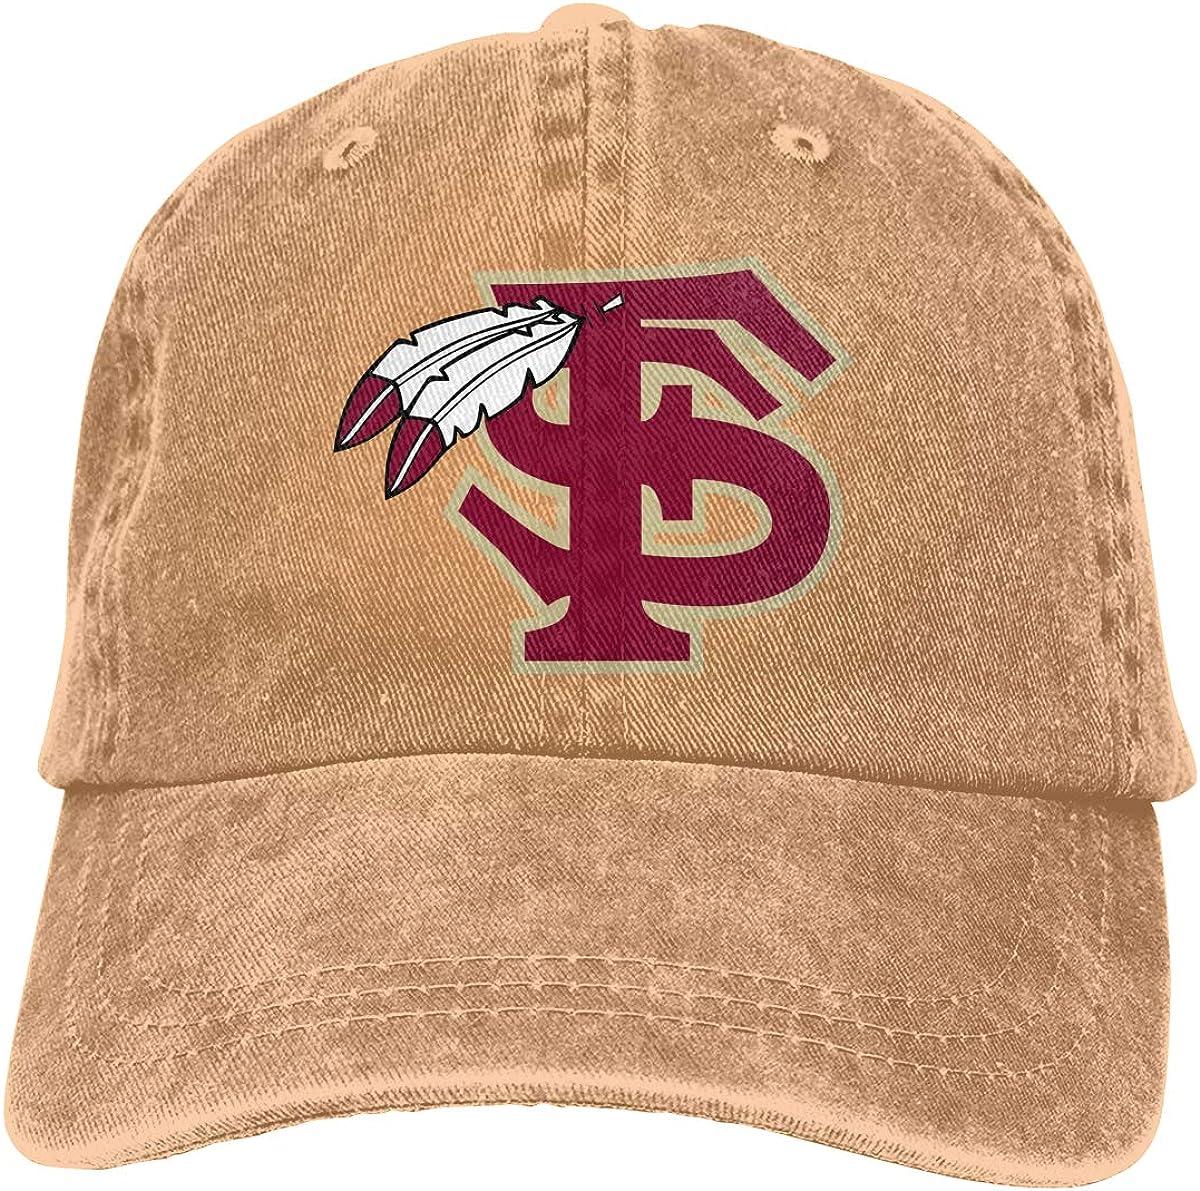 FSU Commemorate Casquette Cap Vintage Adjustable Unisex Baseball Hat